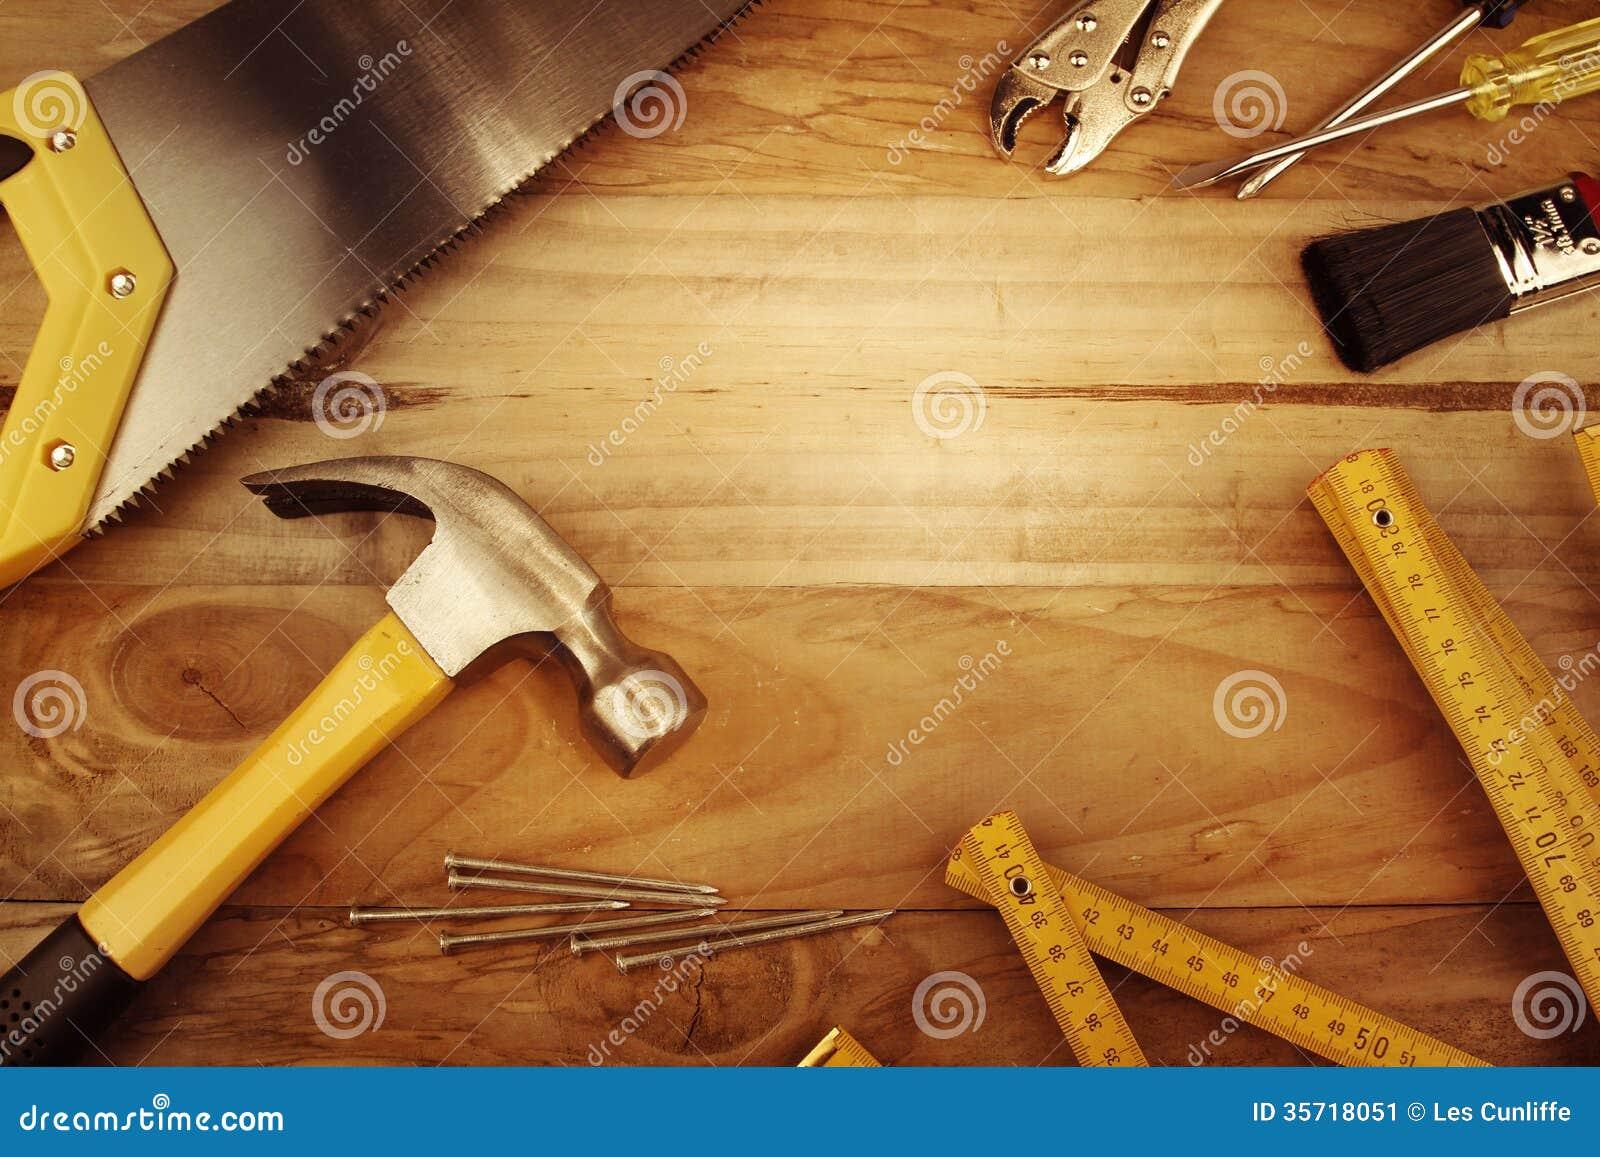 Tools Stock Image Image Of Floor Hardware Equipment 35718051